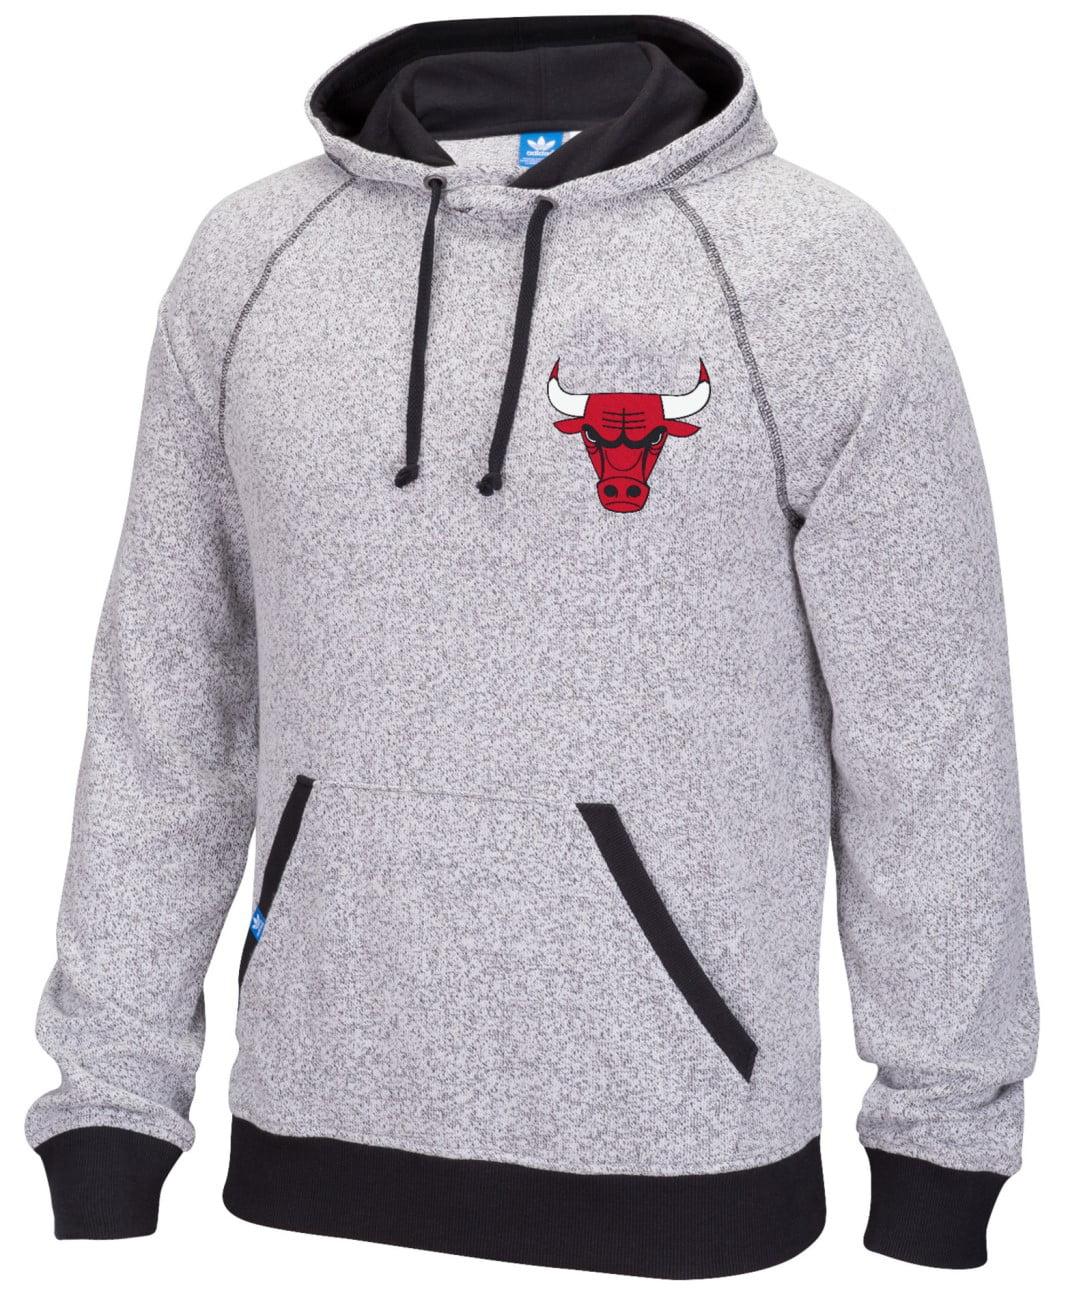 "Chicago Bulls Adidas NBA ""Originals"" Men's Pullover Hooded Sweatshirt by Adidas"